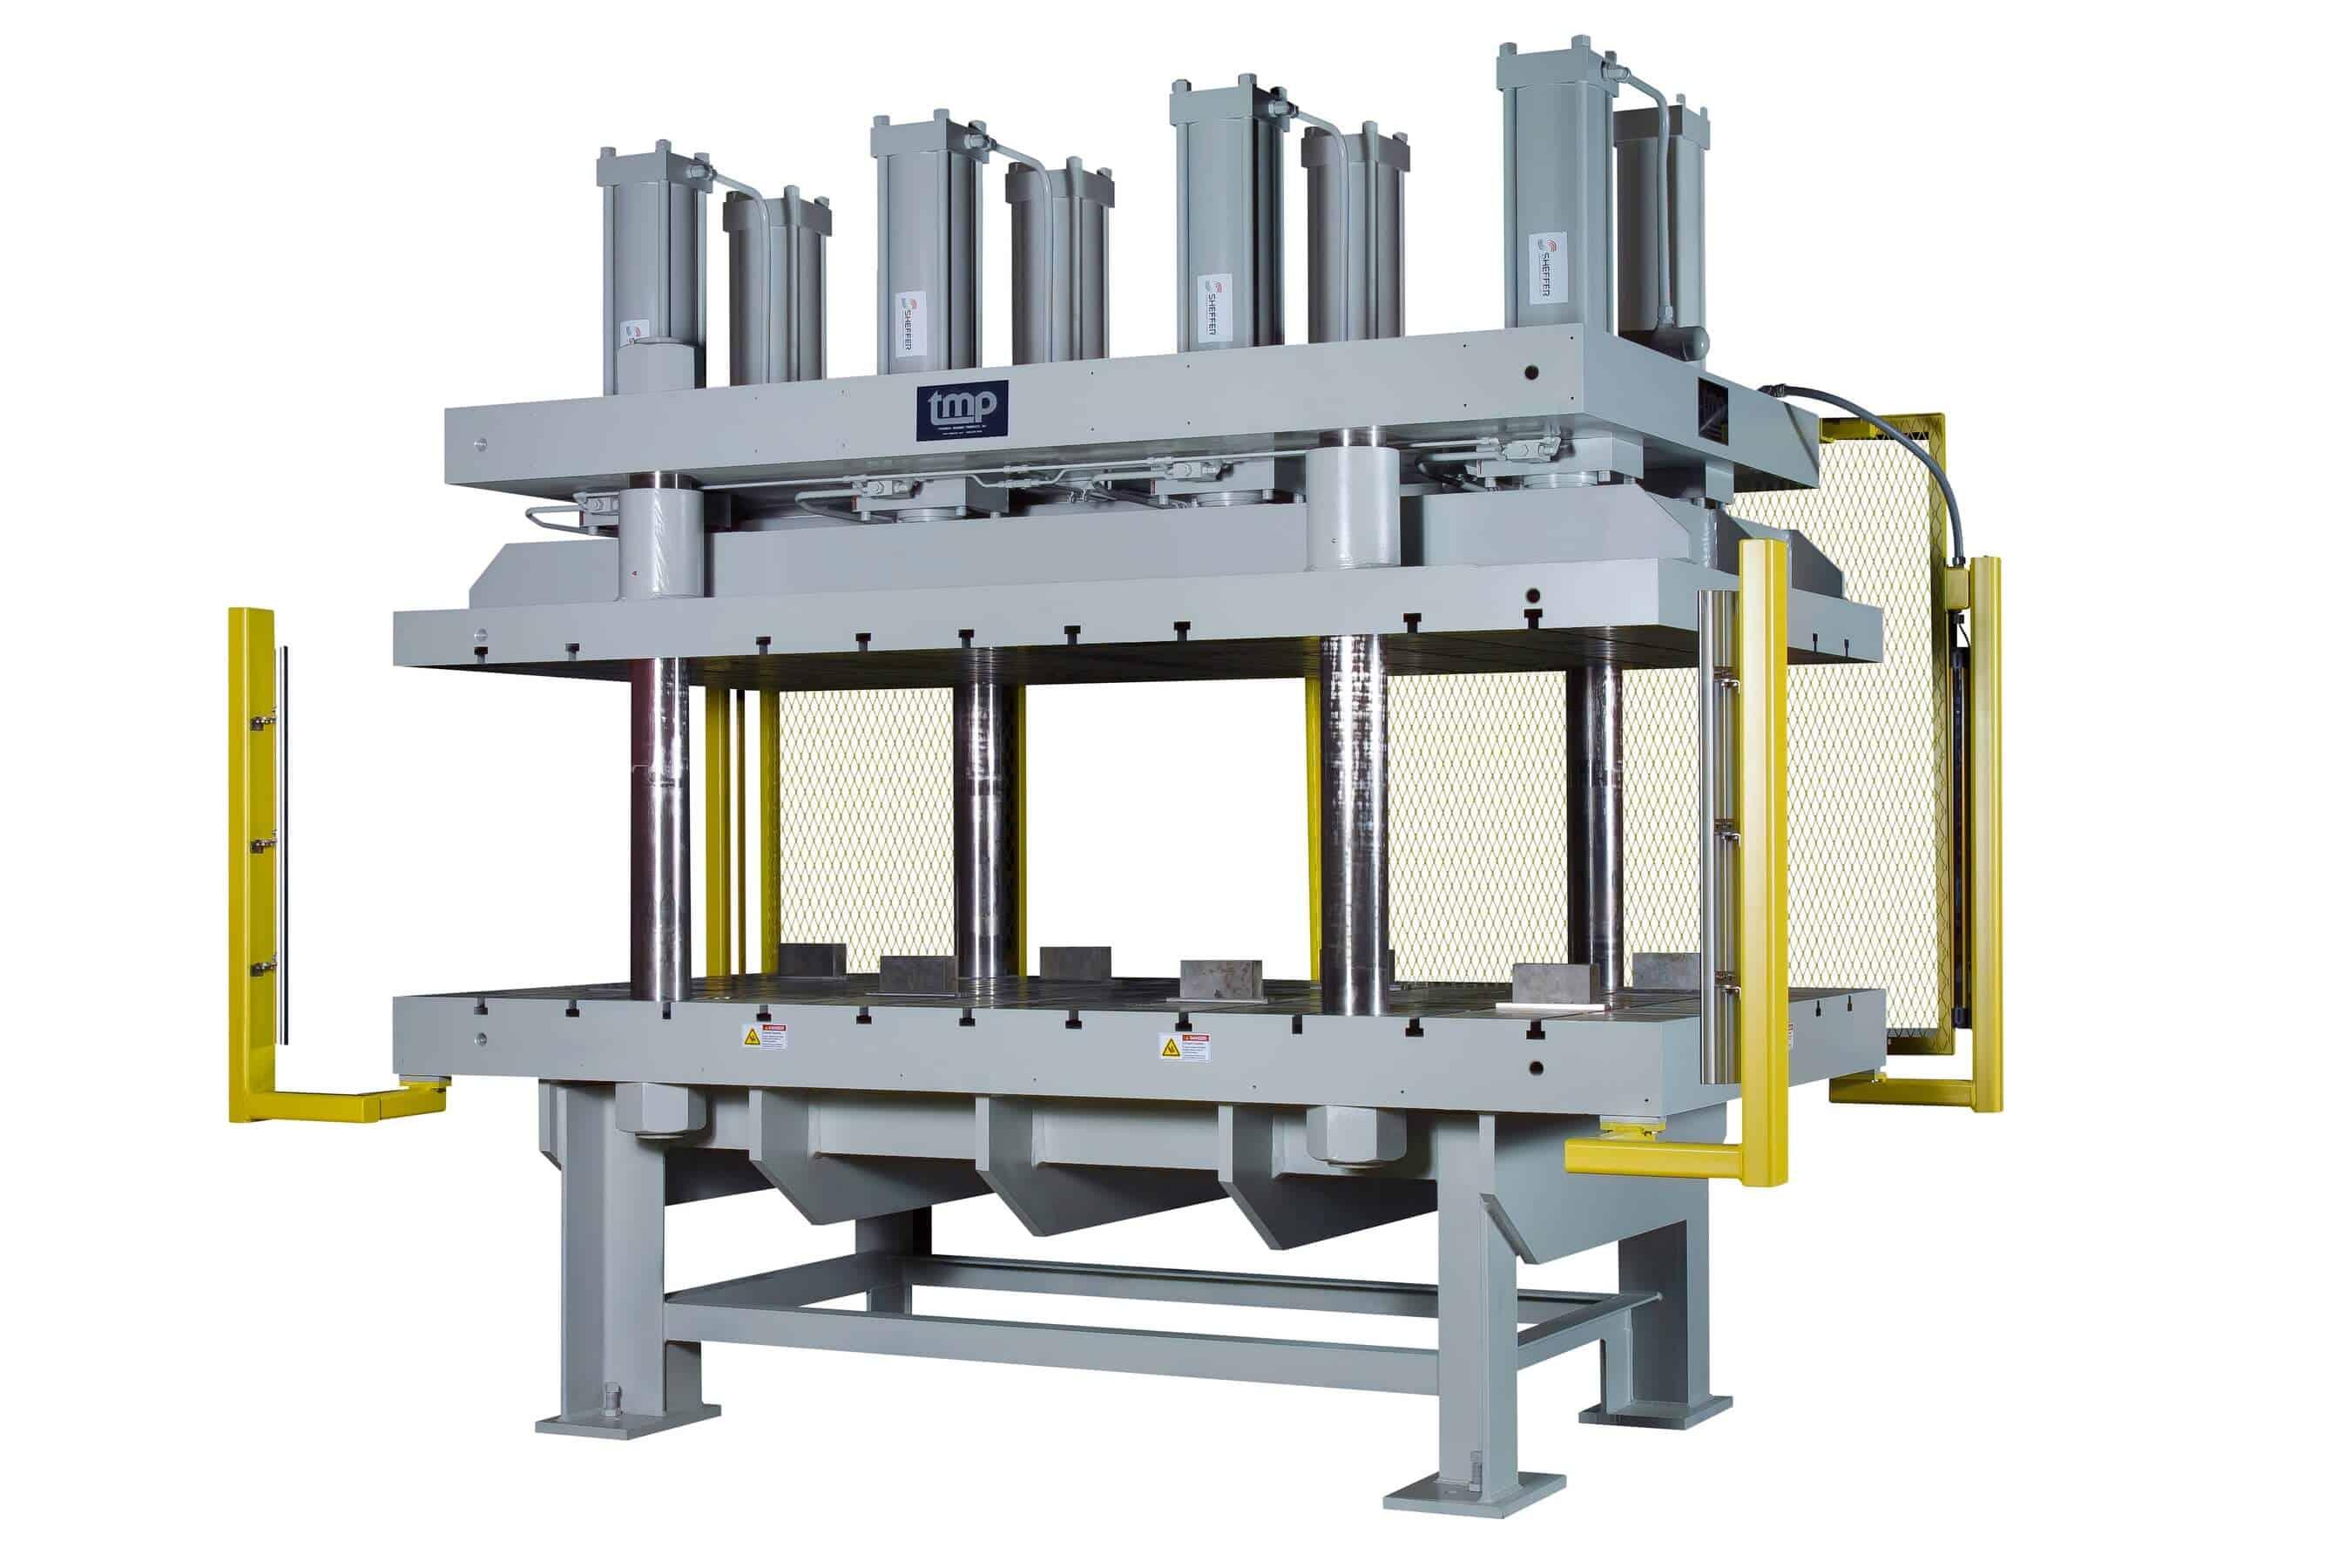 Composite Molding Press for Resins, Composites & Thermoplastics